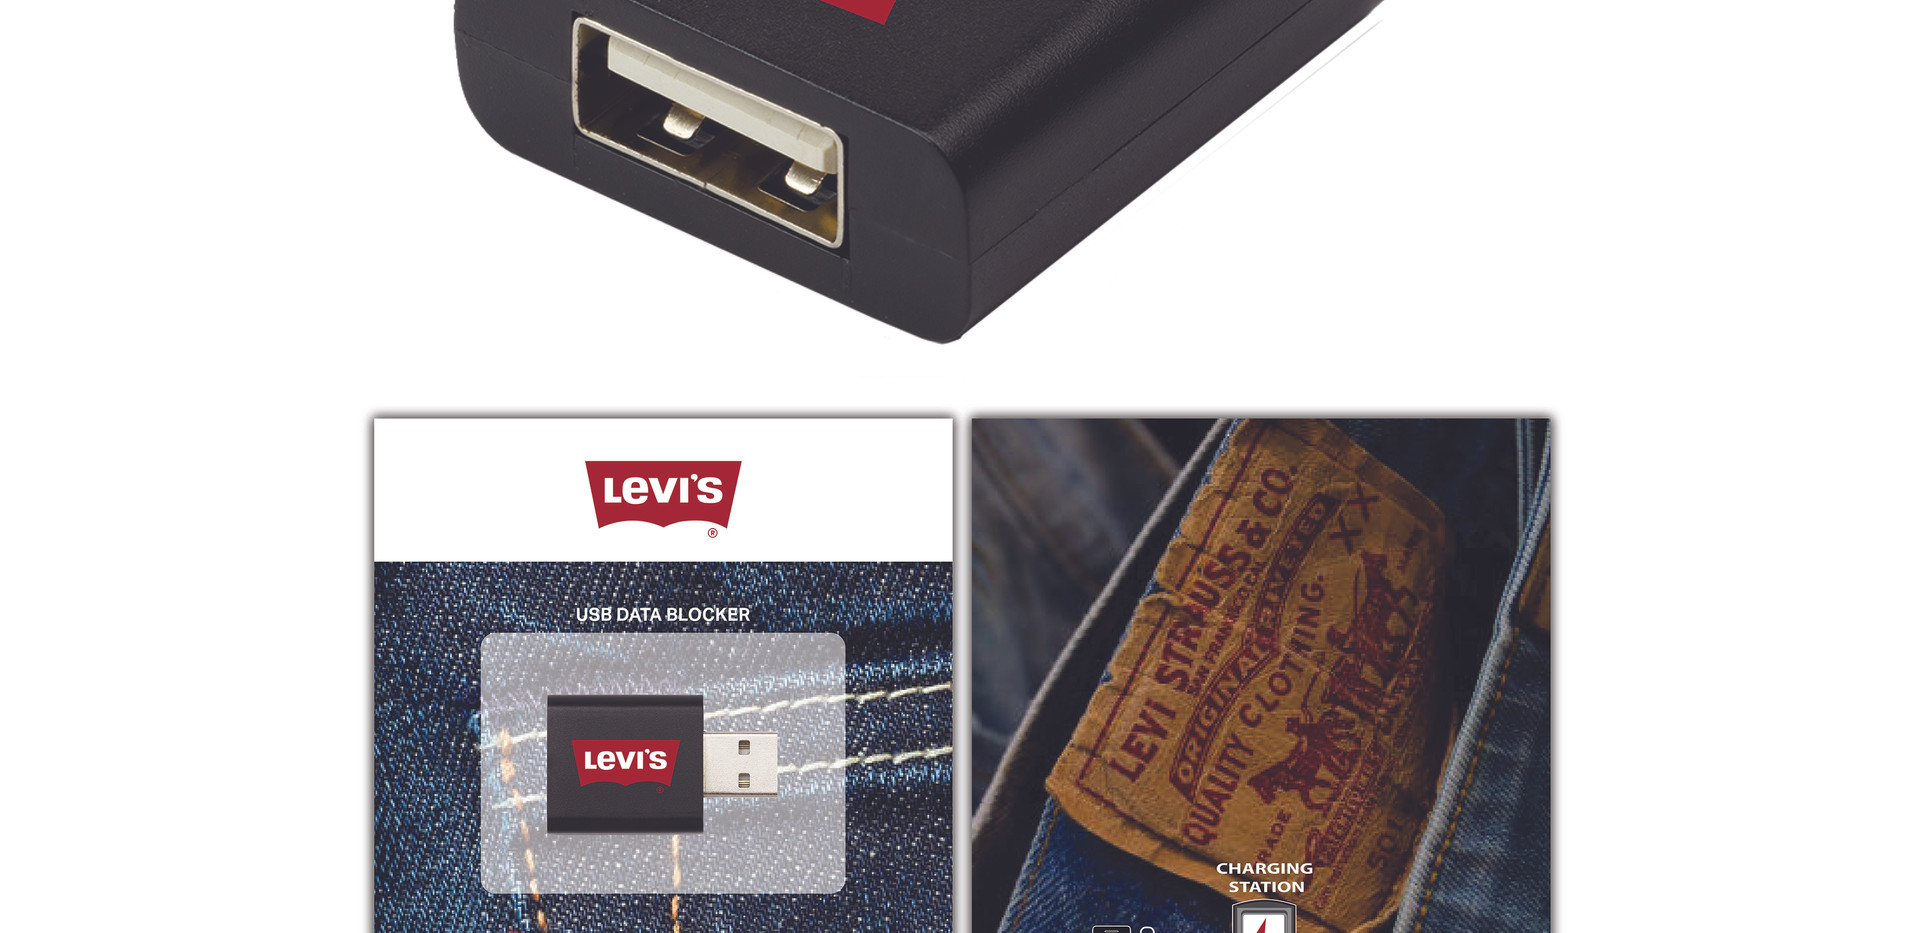 Levi's USDB Custom Card.jpg